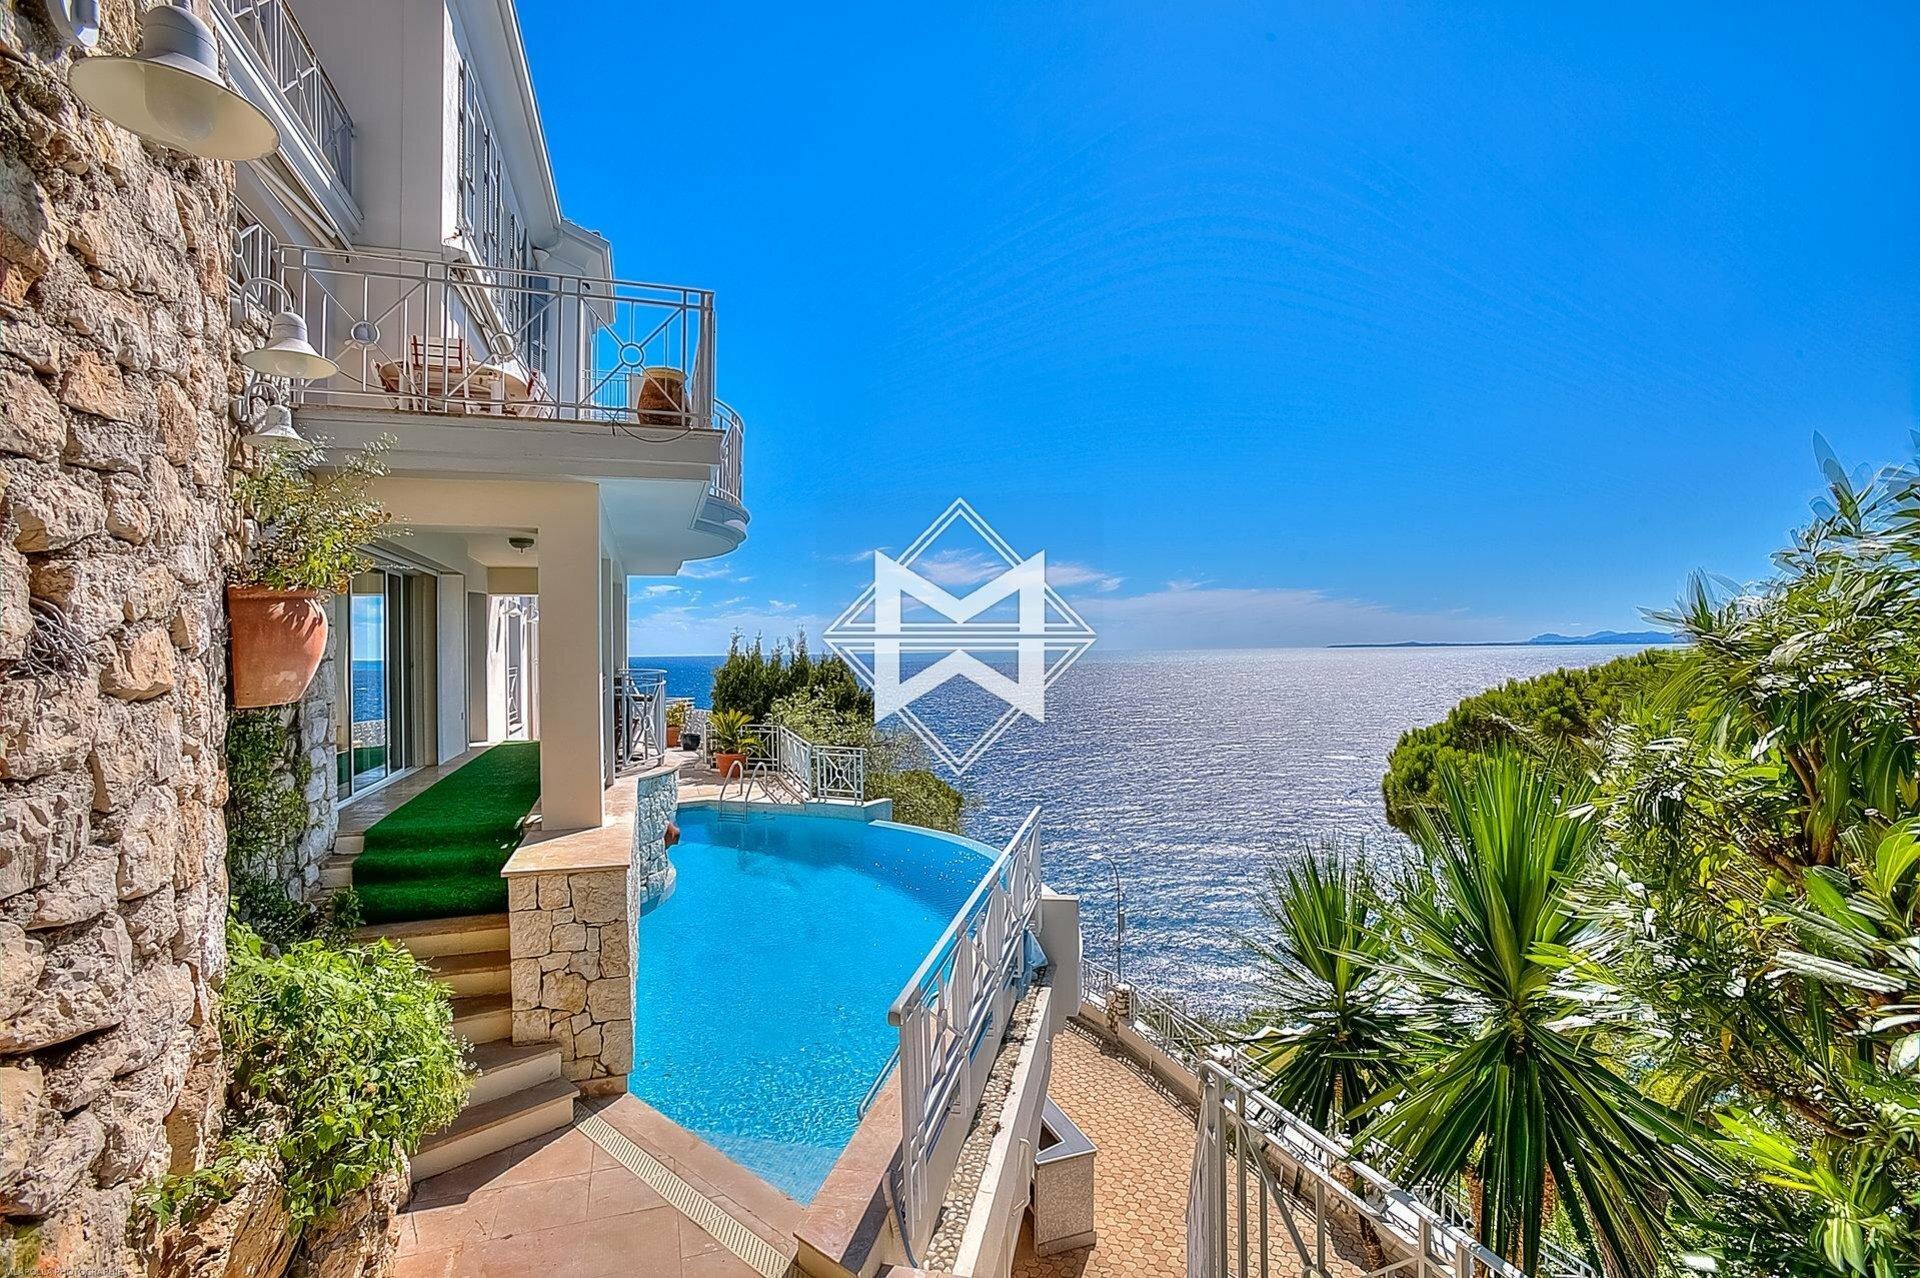 Villa in Nice, Provence-Alpes-Côte d'Azur, France 1 - 11099168